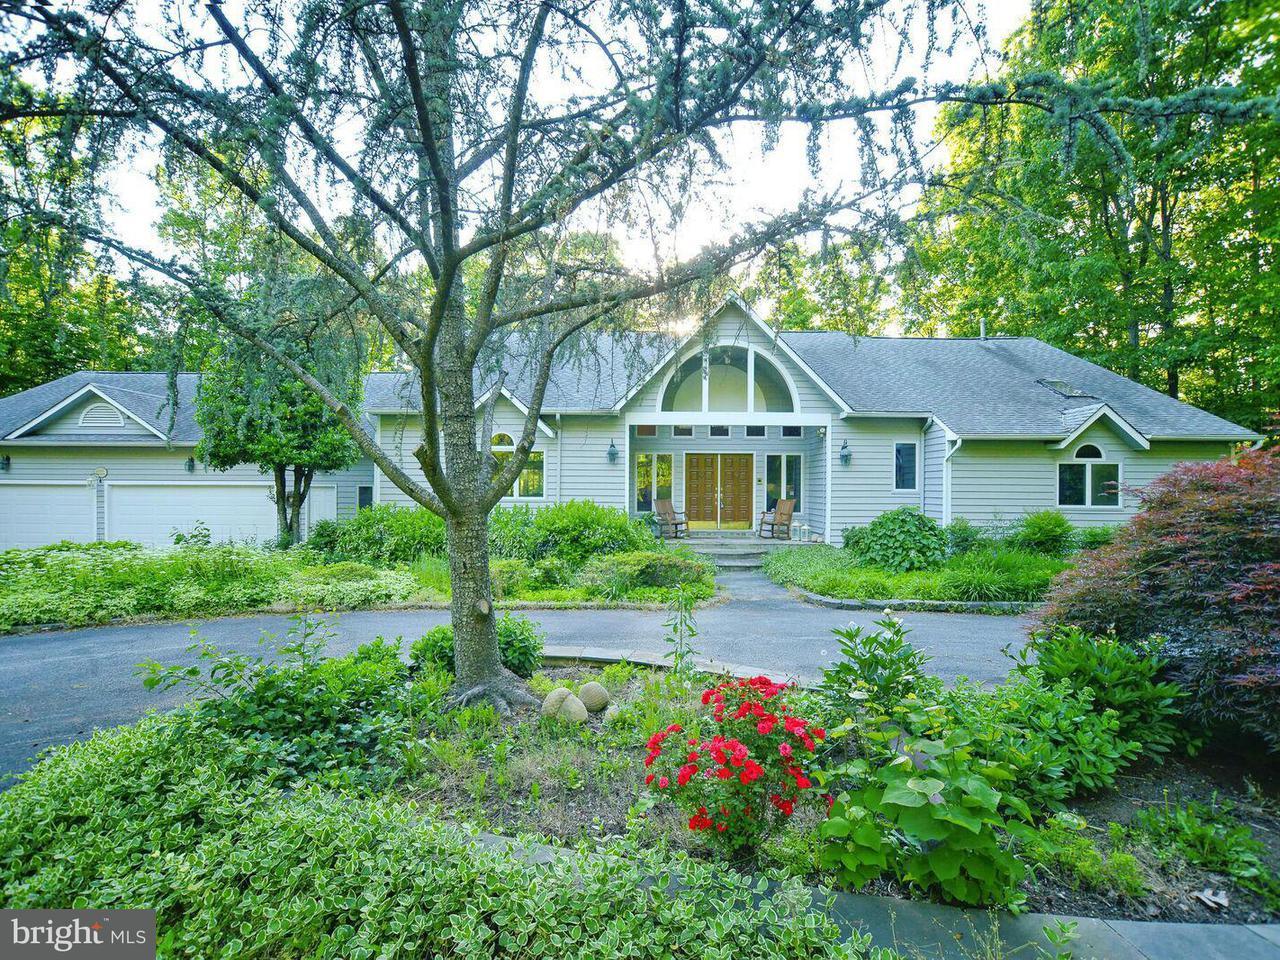 独户住宅 为 销售 在 2905 WALLERS QUARTERS Road 2905 WALLERS QUARTERS Road Bumpass, 弗吉尼亚州 23024 美国